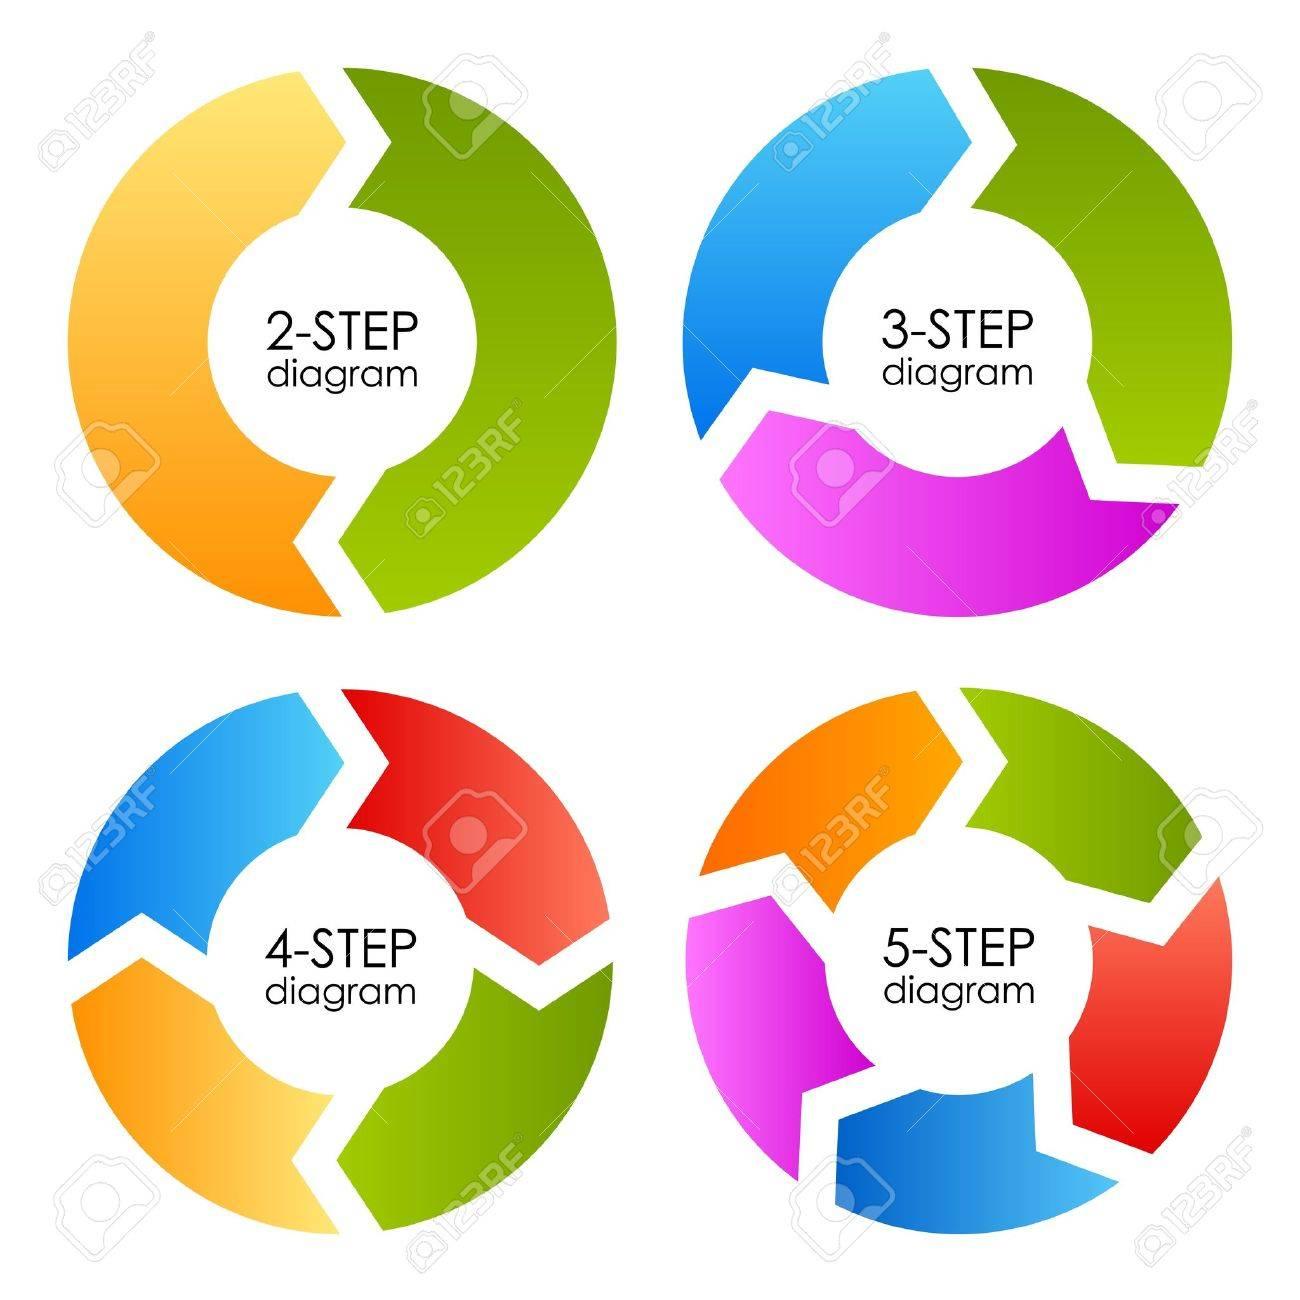 Process cycling arrow by arrow royalty free stock images image - Process Arrows Cycle Process Diagrams Set Vector Illustration